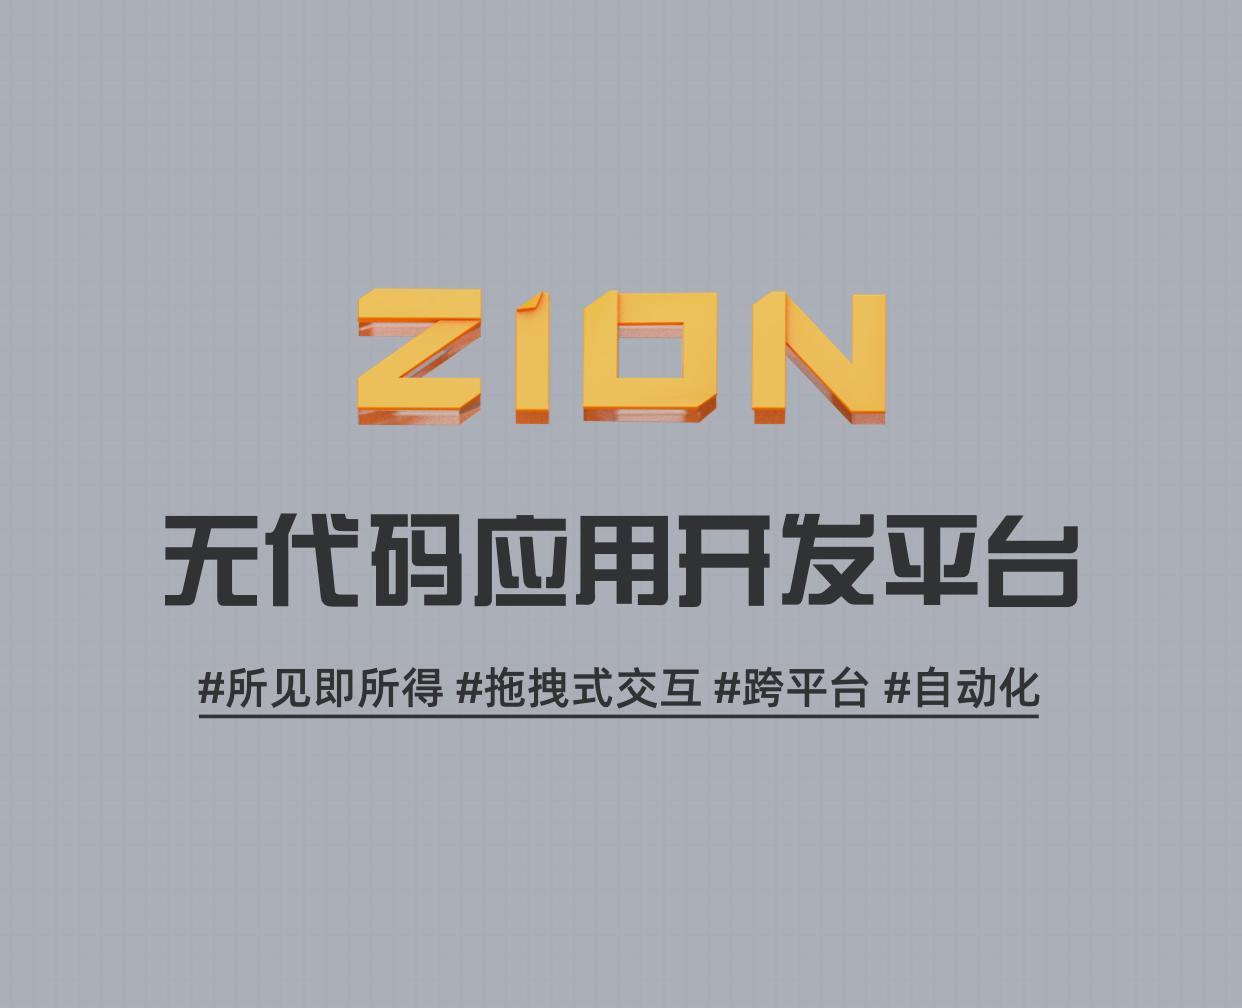 Zion官方小程序